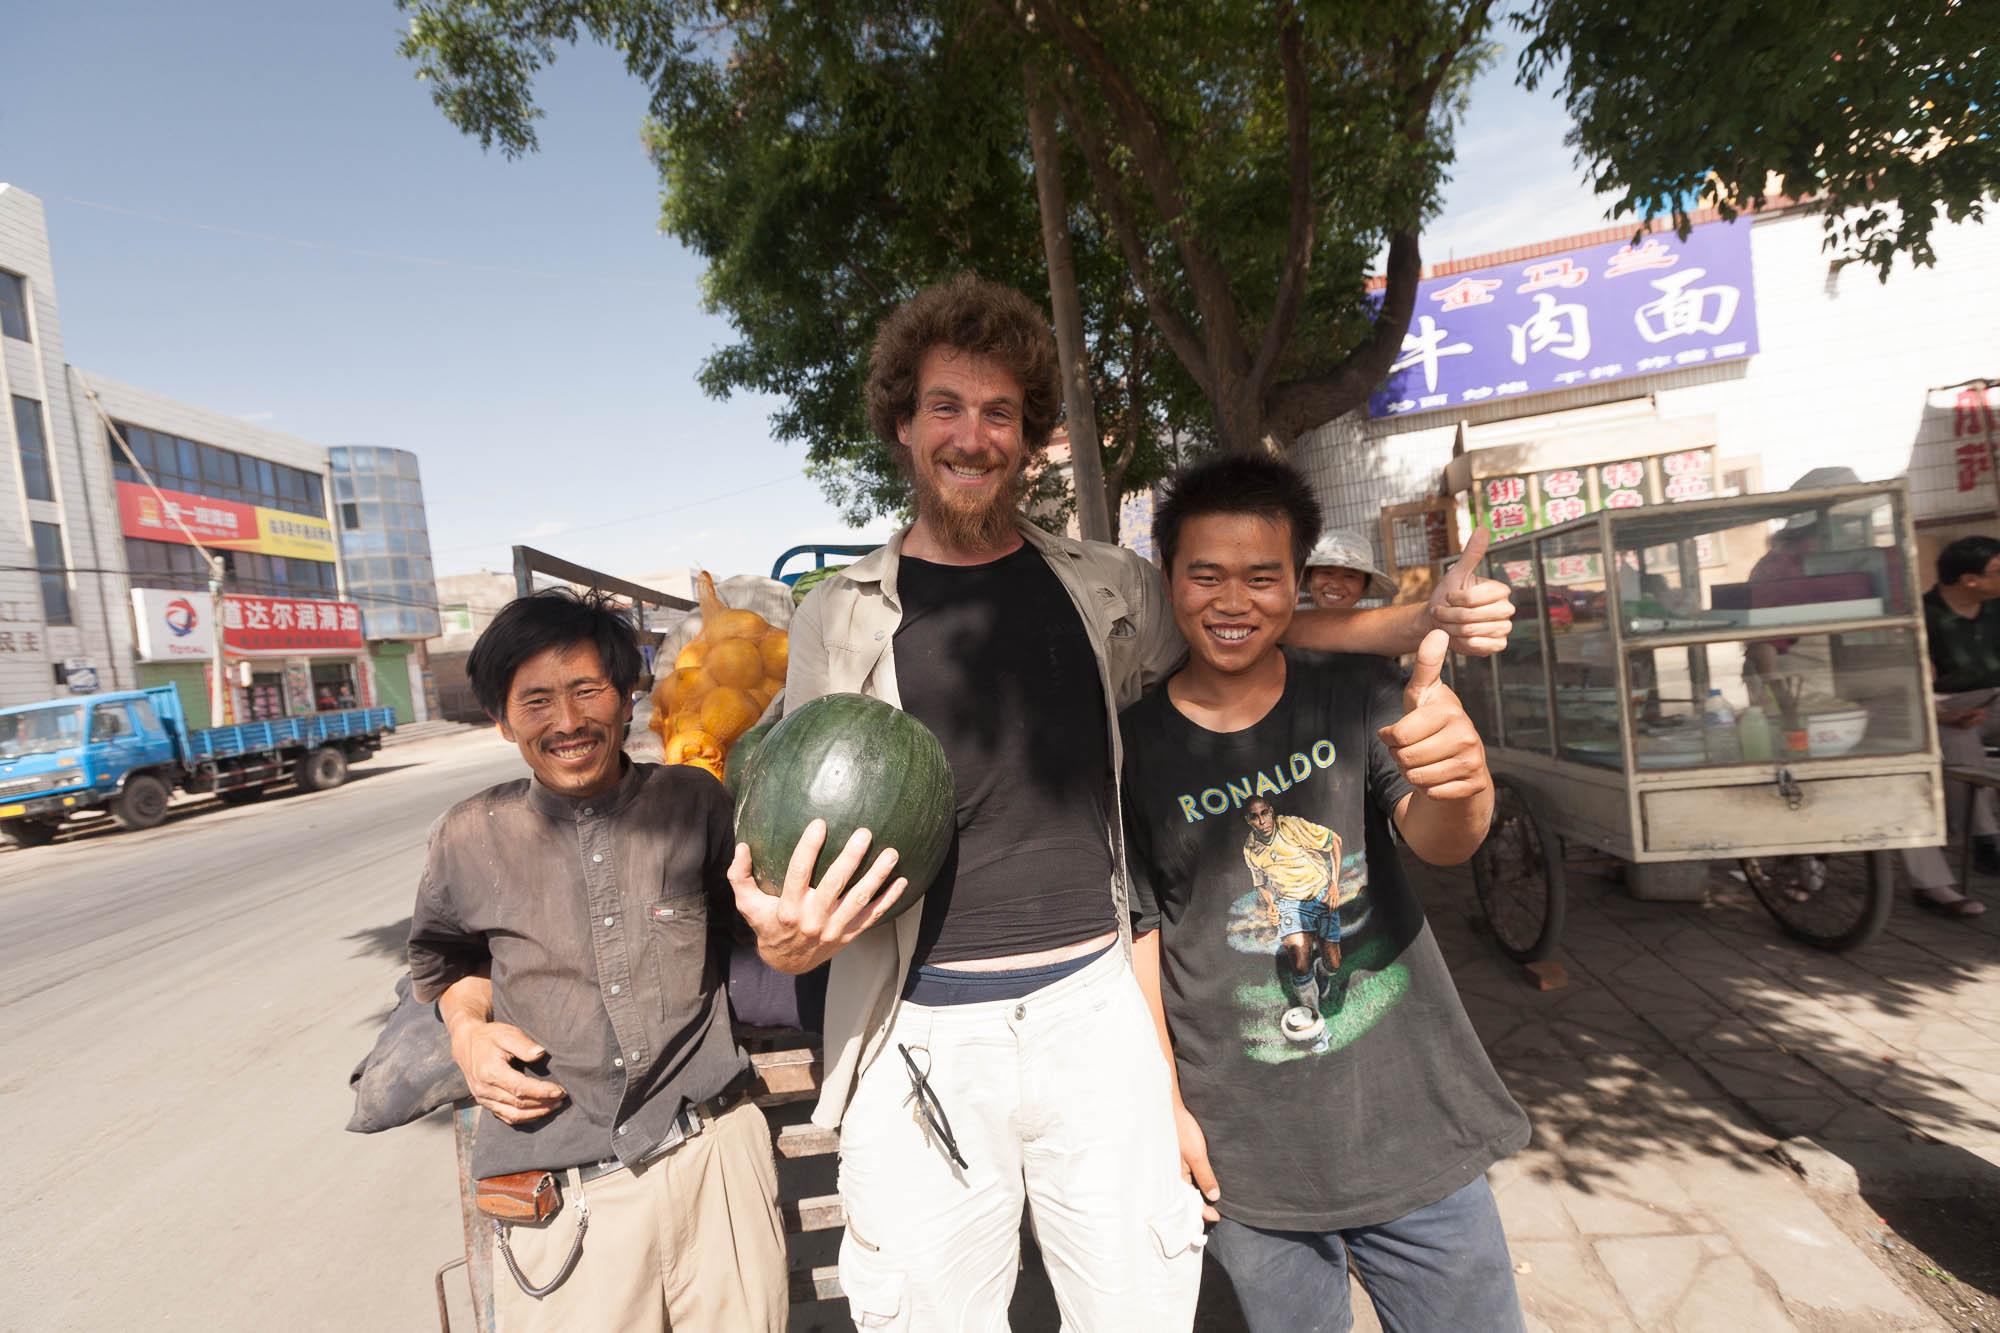 Liu Peng gave me a nice seedless watermelon